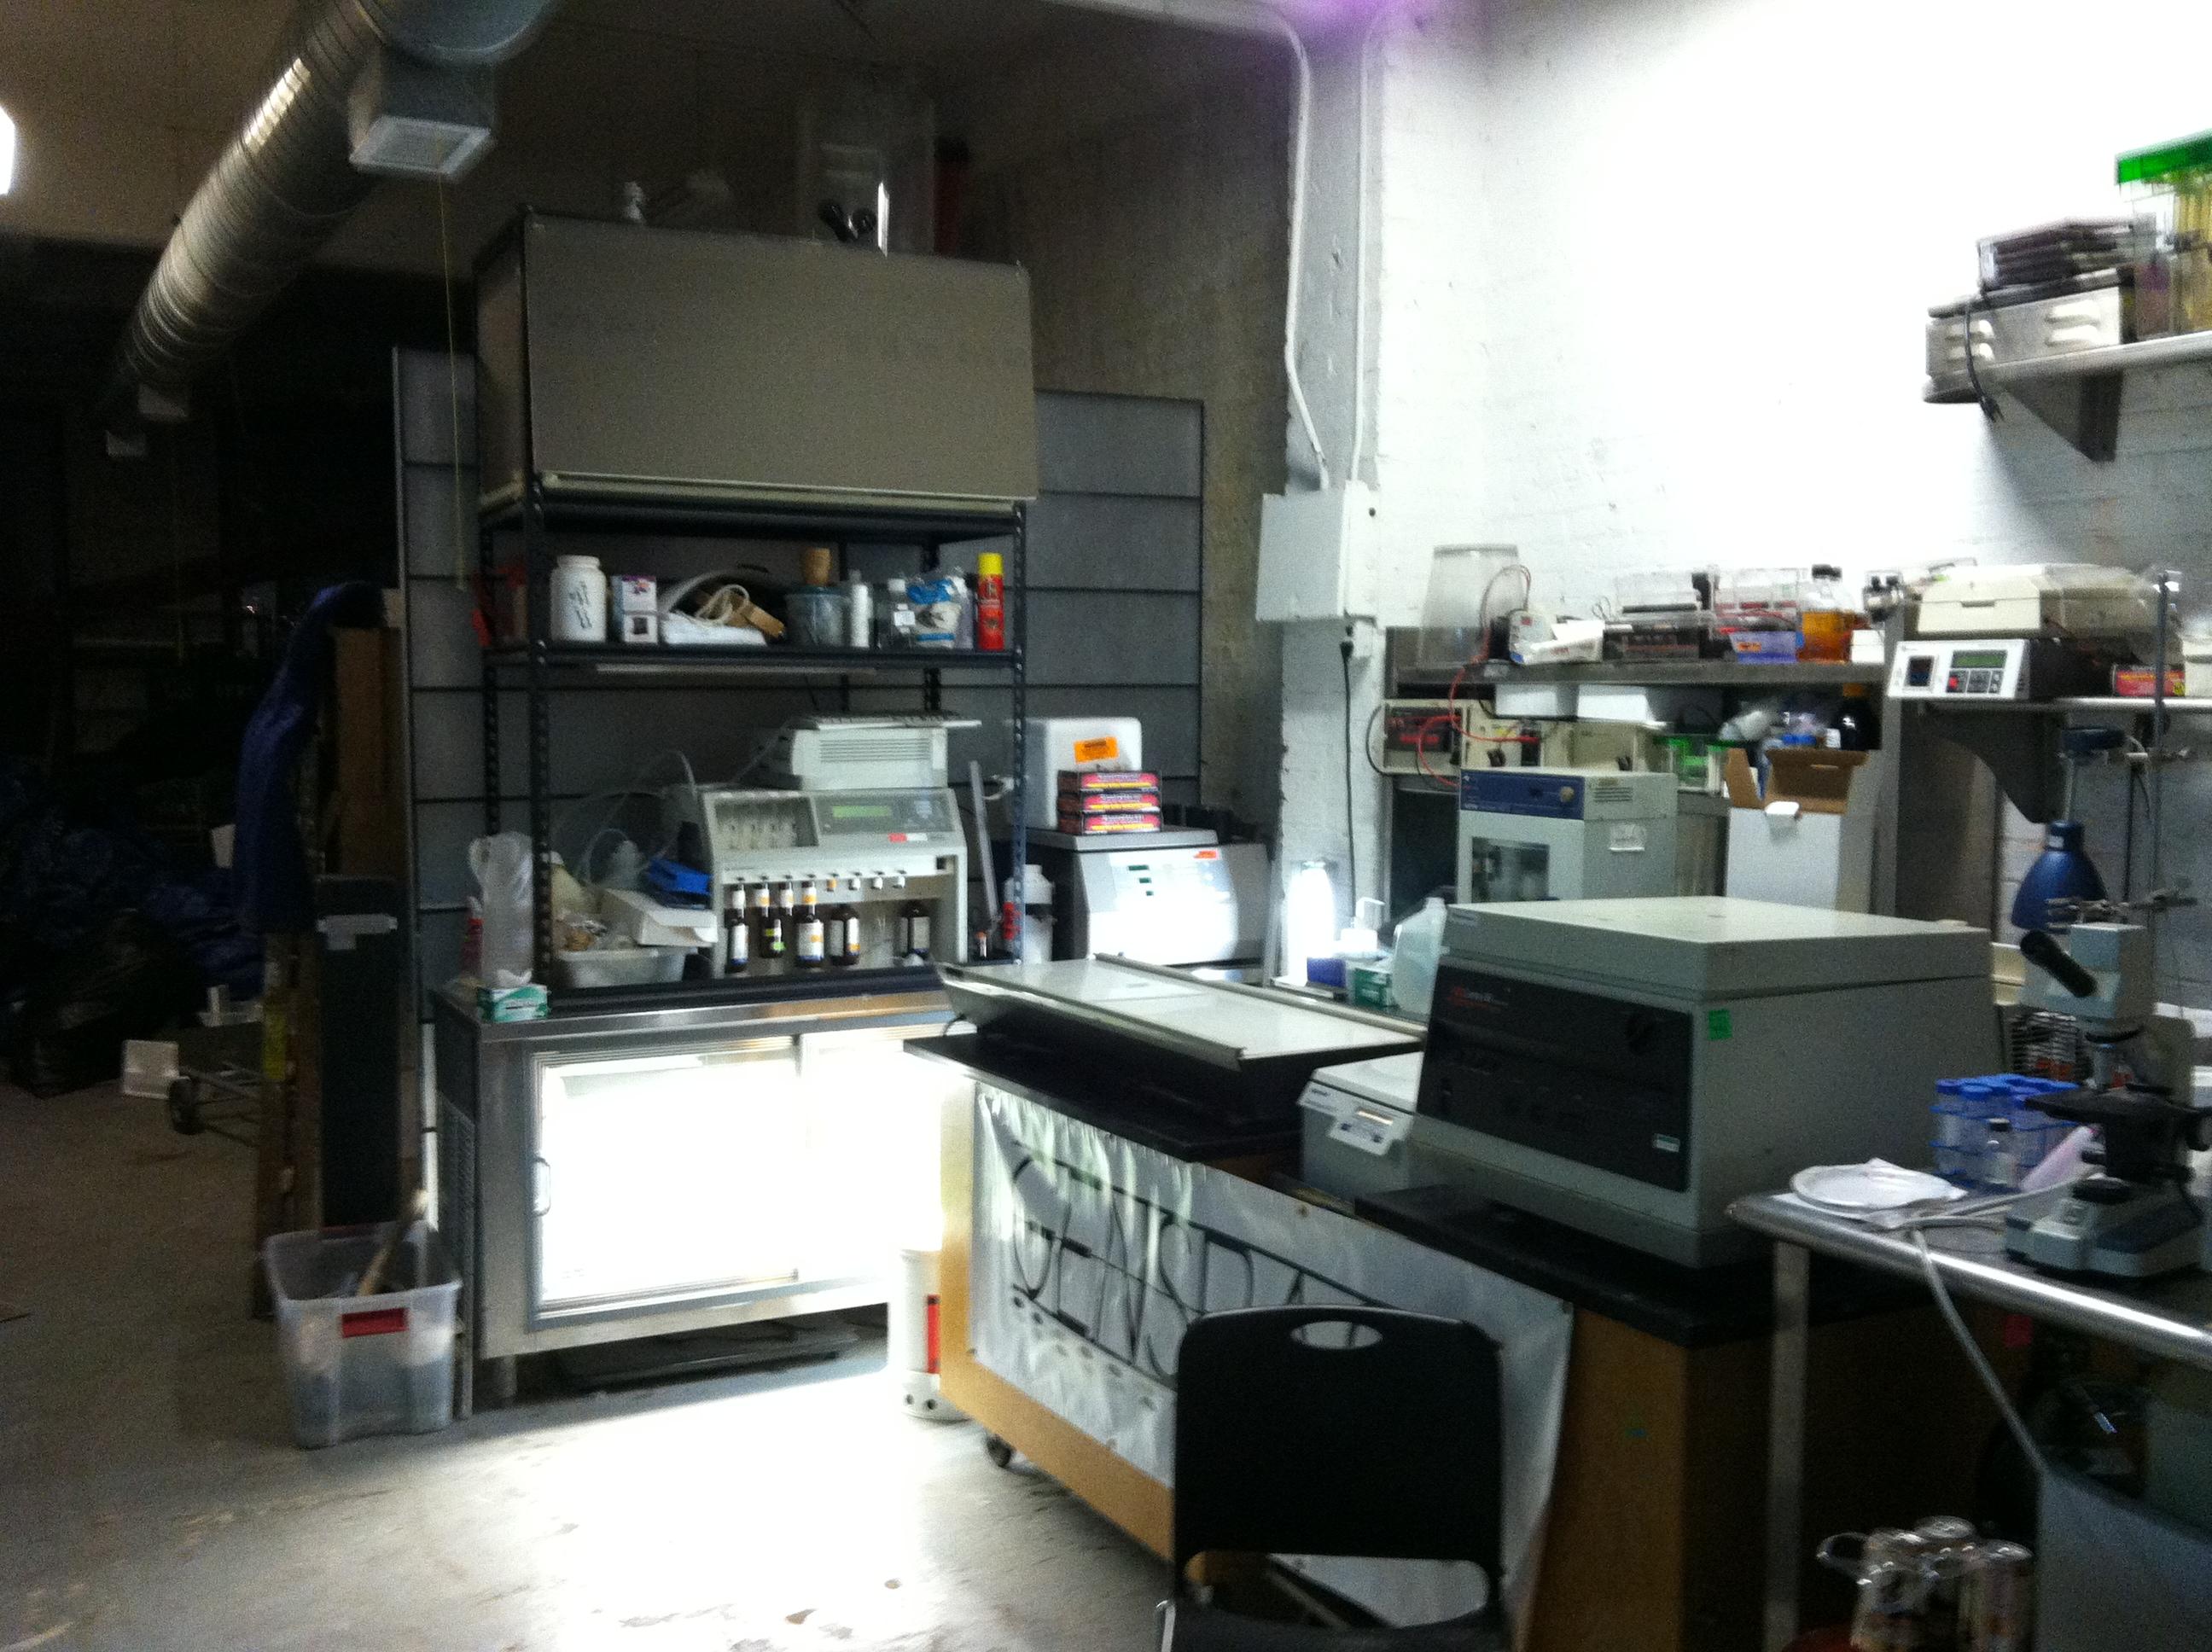 Genspace: Your Friendly, Neighborhood Laboratory